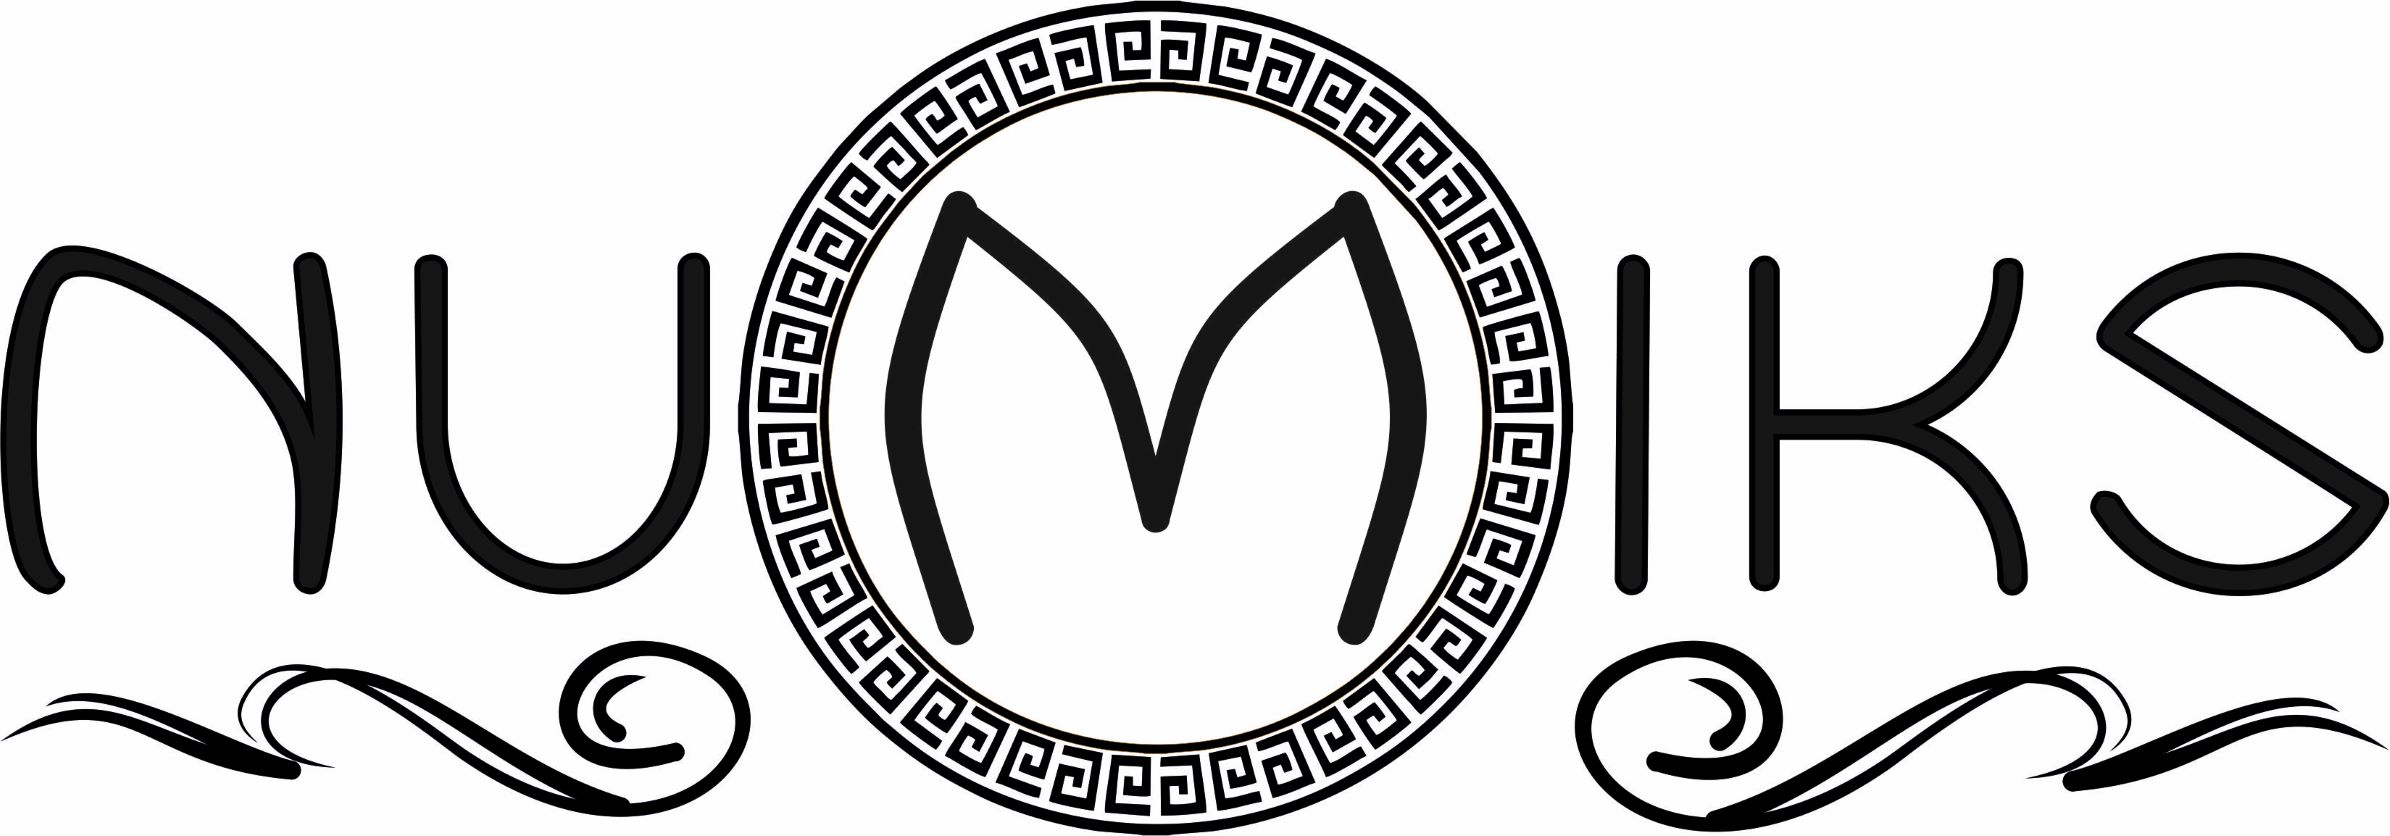 Логотип для интернет-магазина фото f_0625ecd25334f22f.jpg